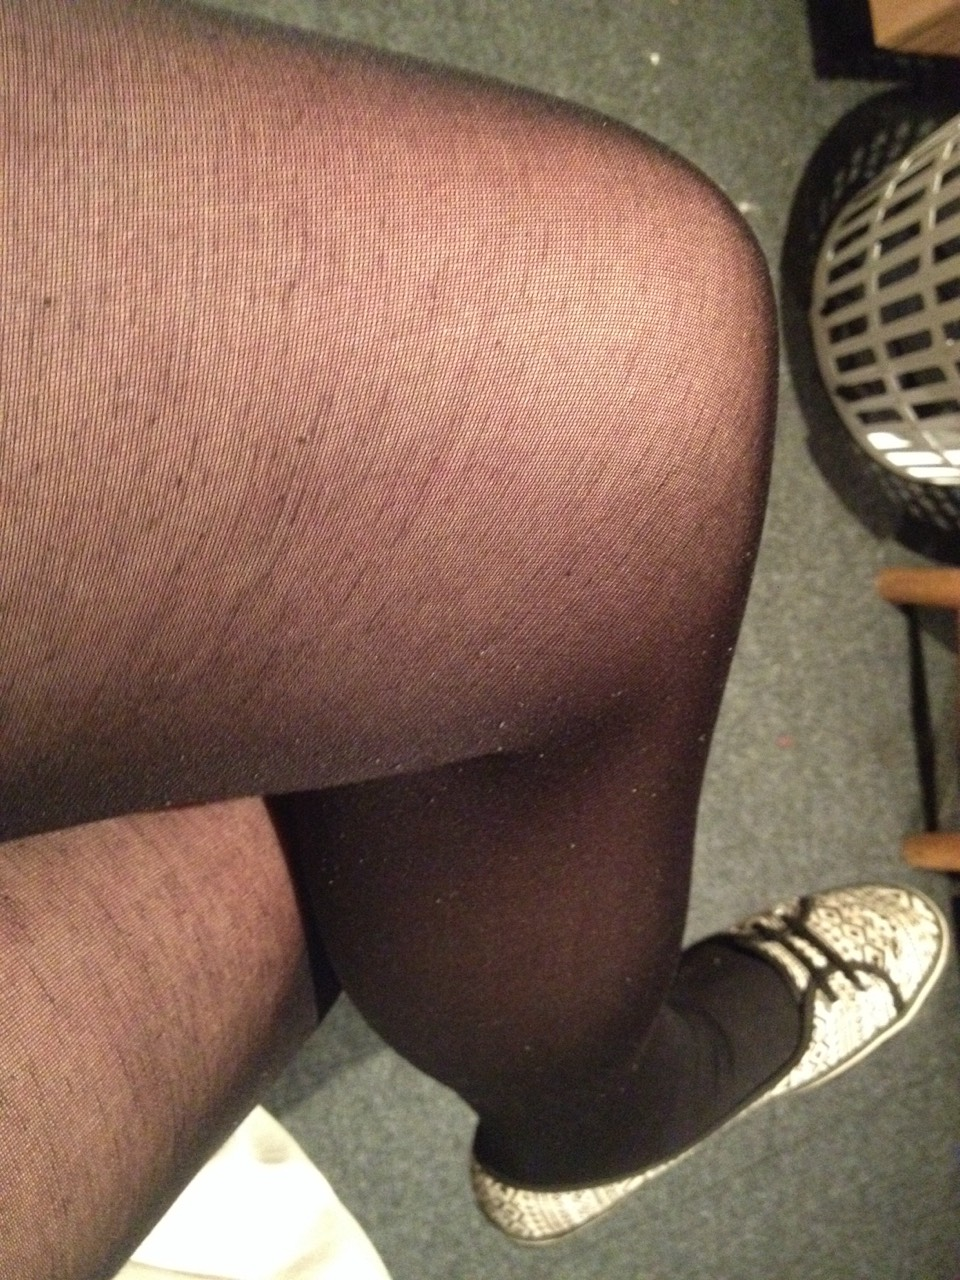 Some plain black tights